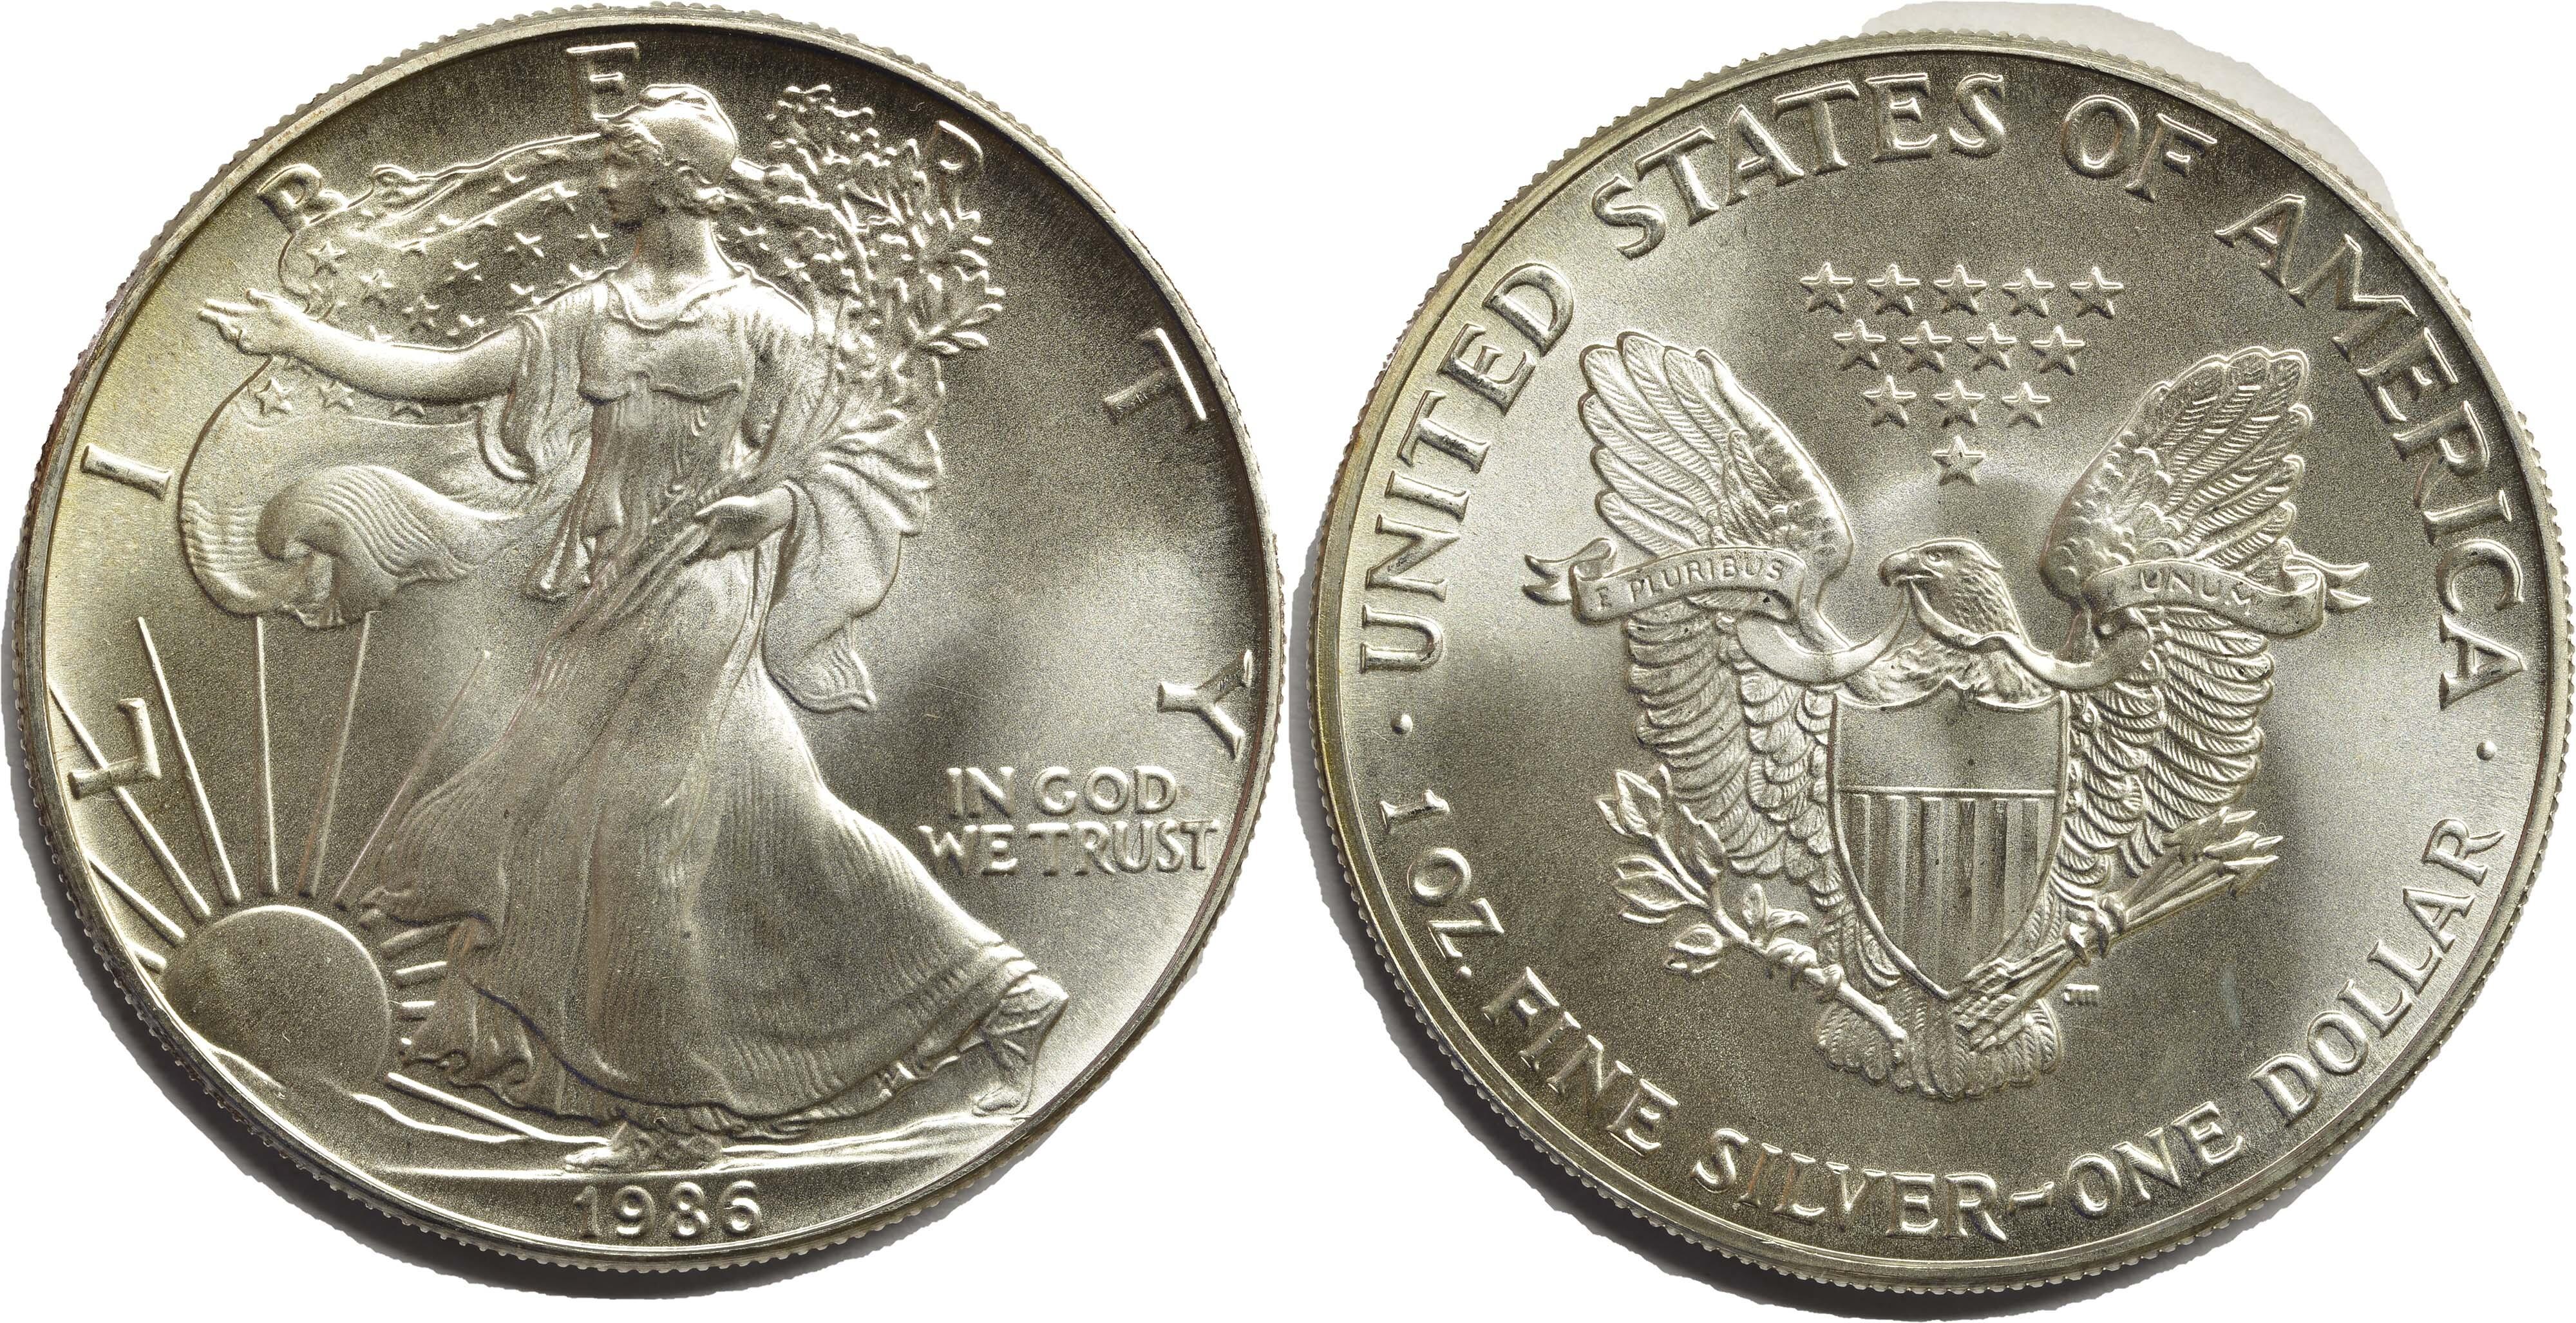 Lieferumfang:USA : 1 Dollar American Eagle  1986 bfr